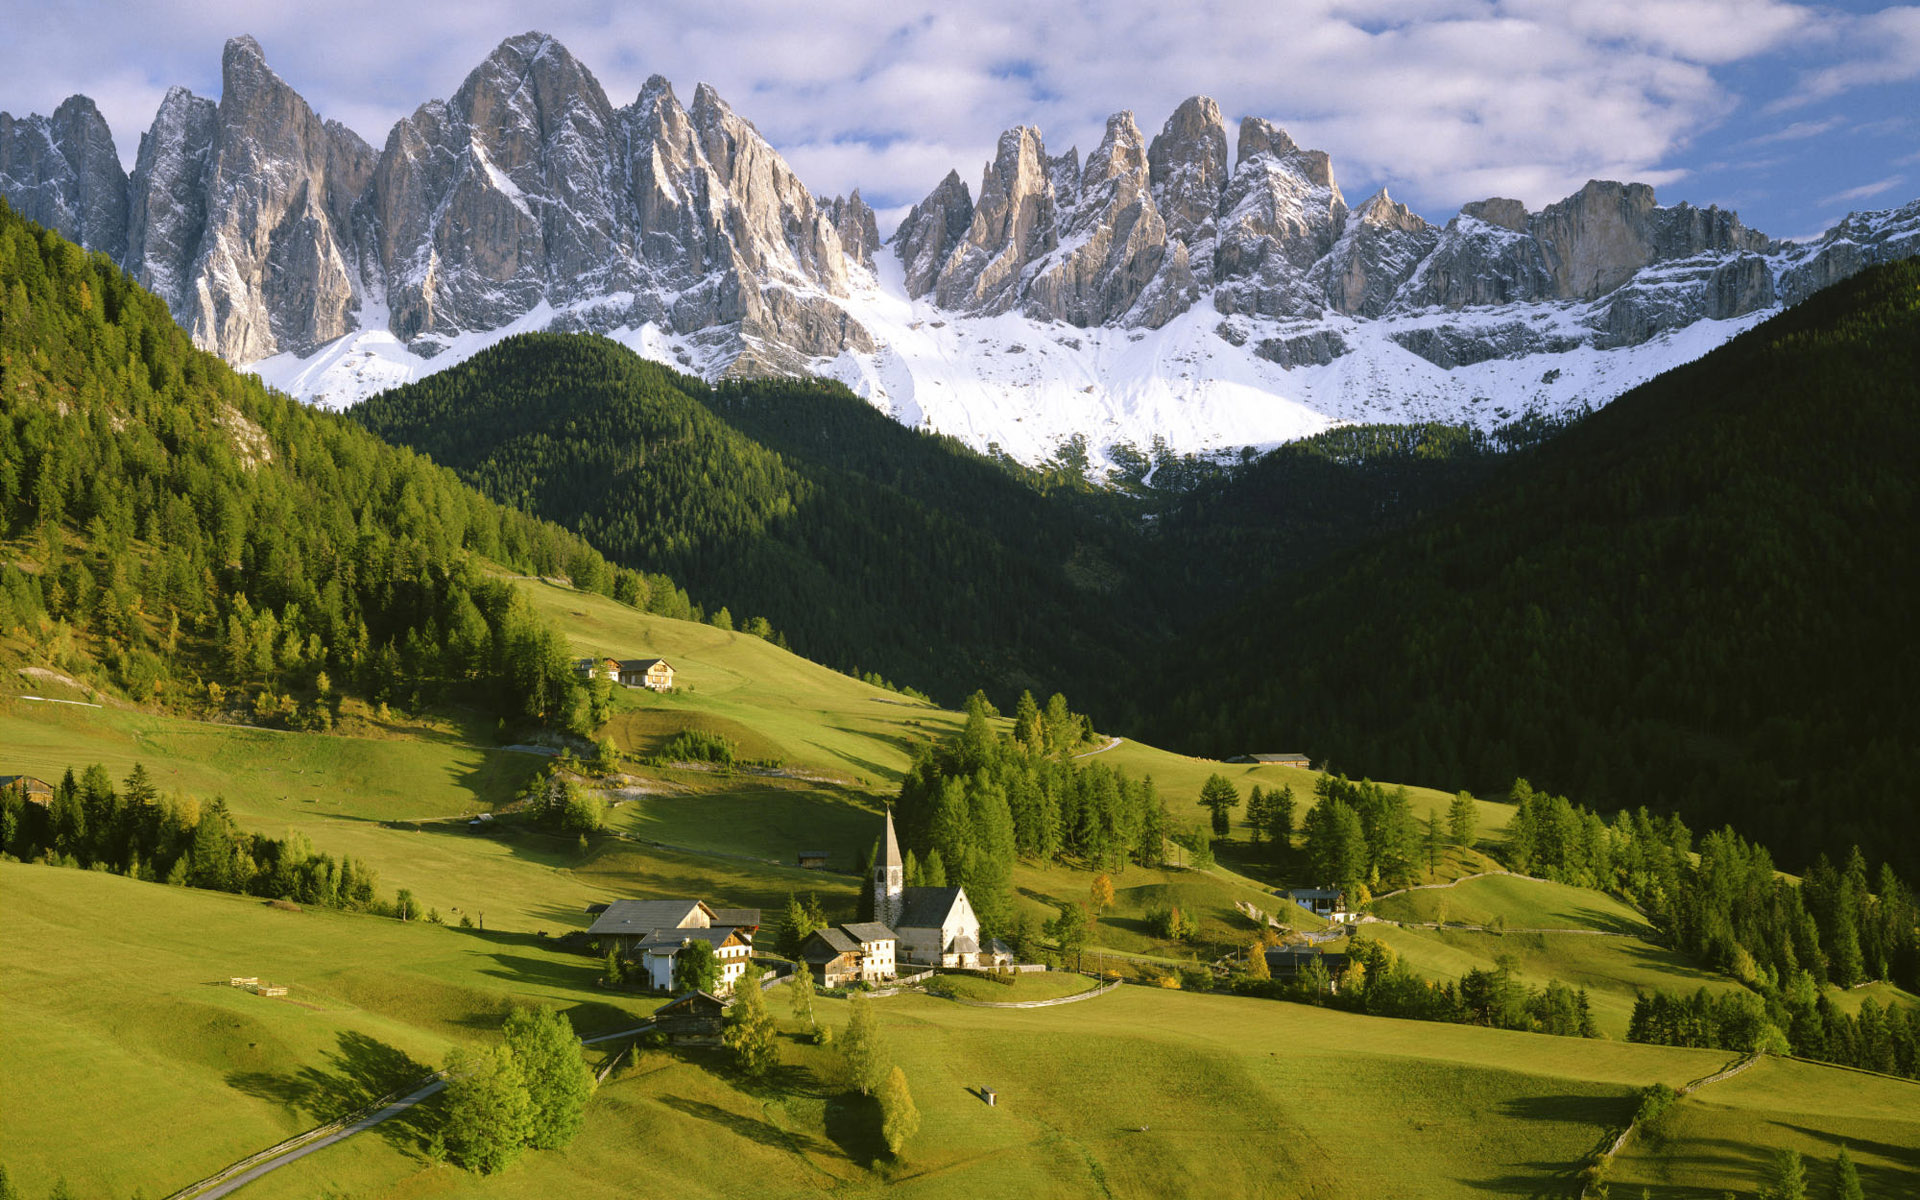 Italy Wallpapers Beautifulitalyscenerytr